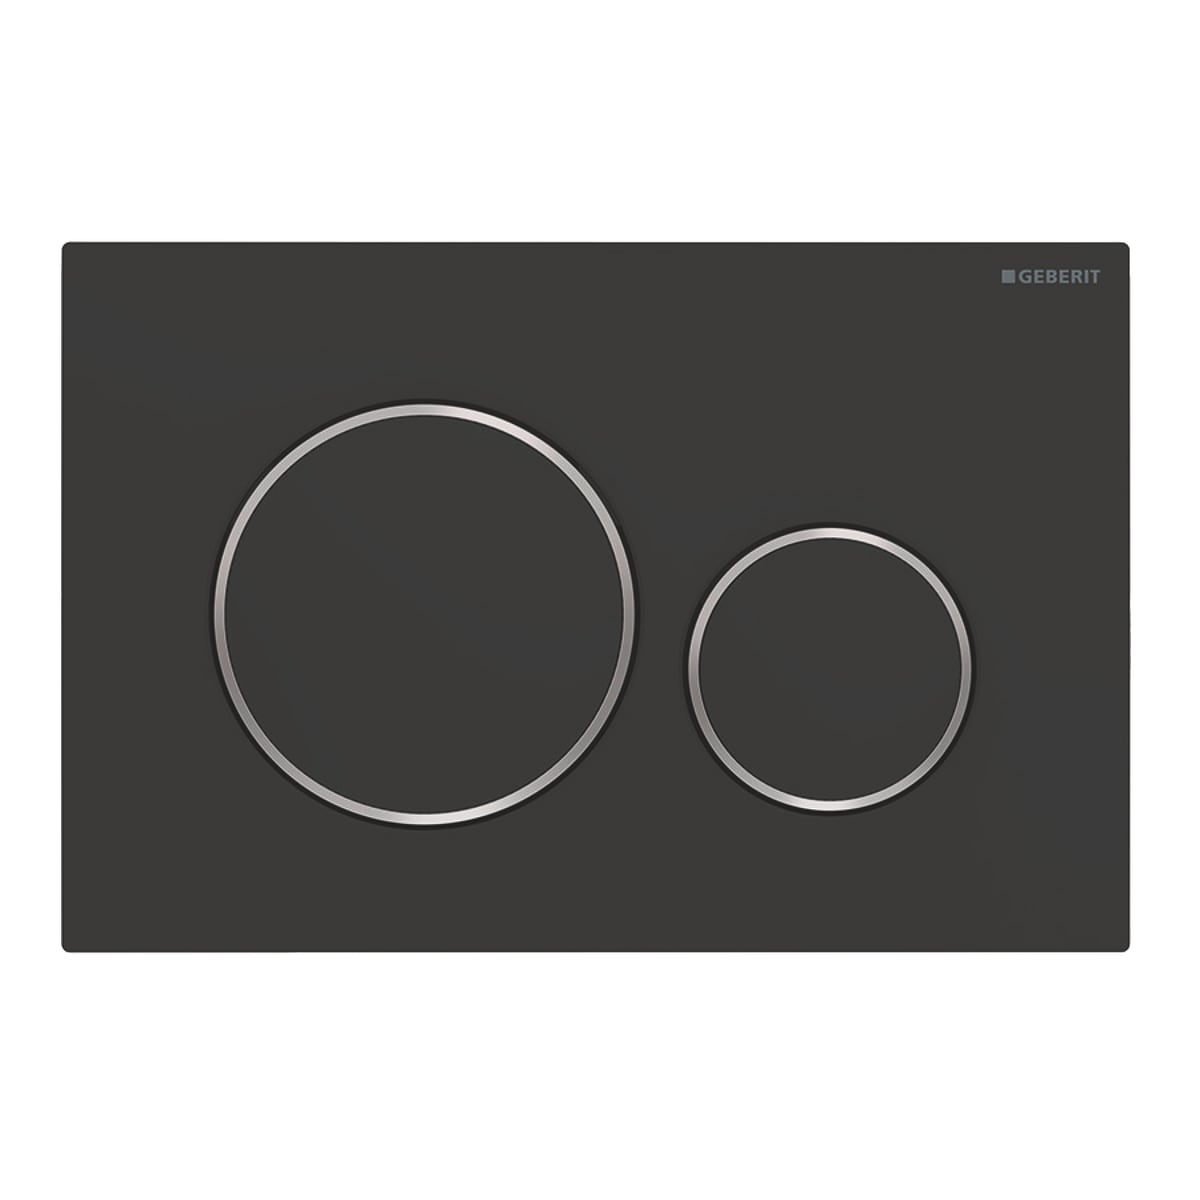 Geberit Sigma 20 drukplaat DF mat zwart t.b.v. Sigma Up reservoir